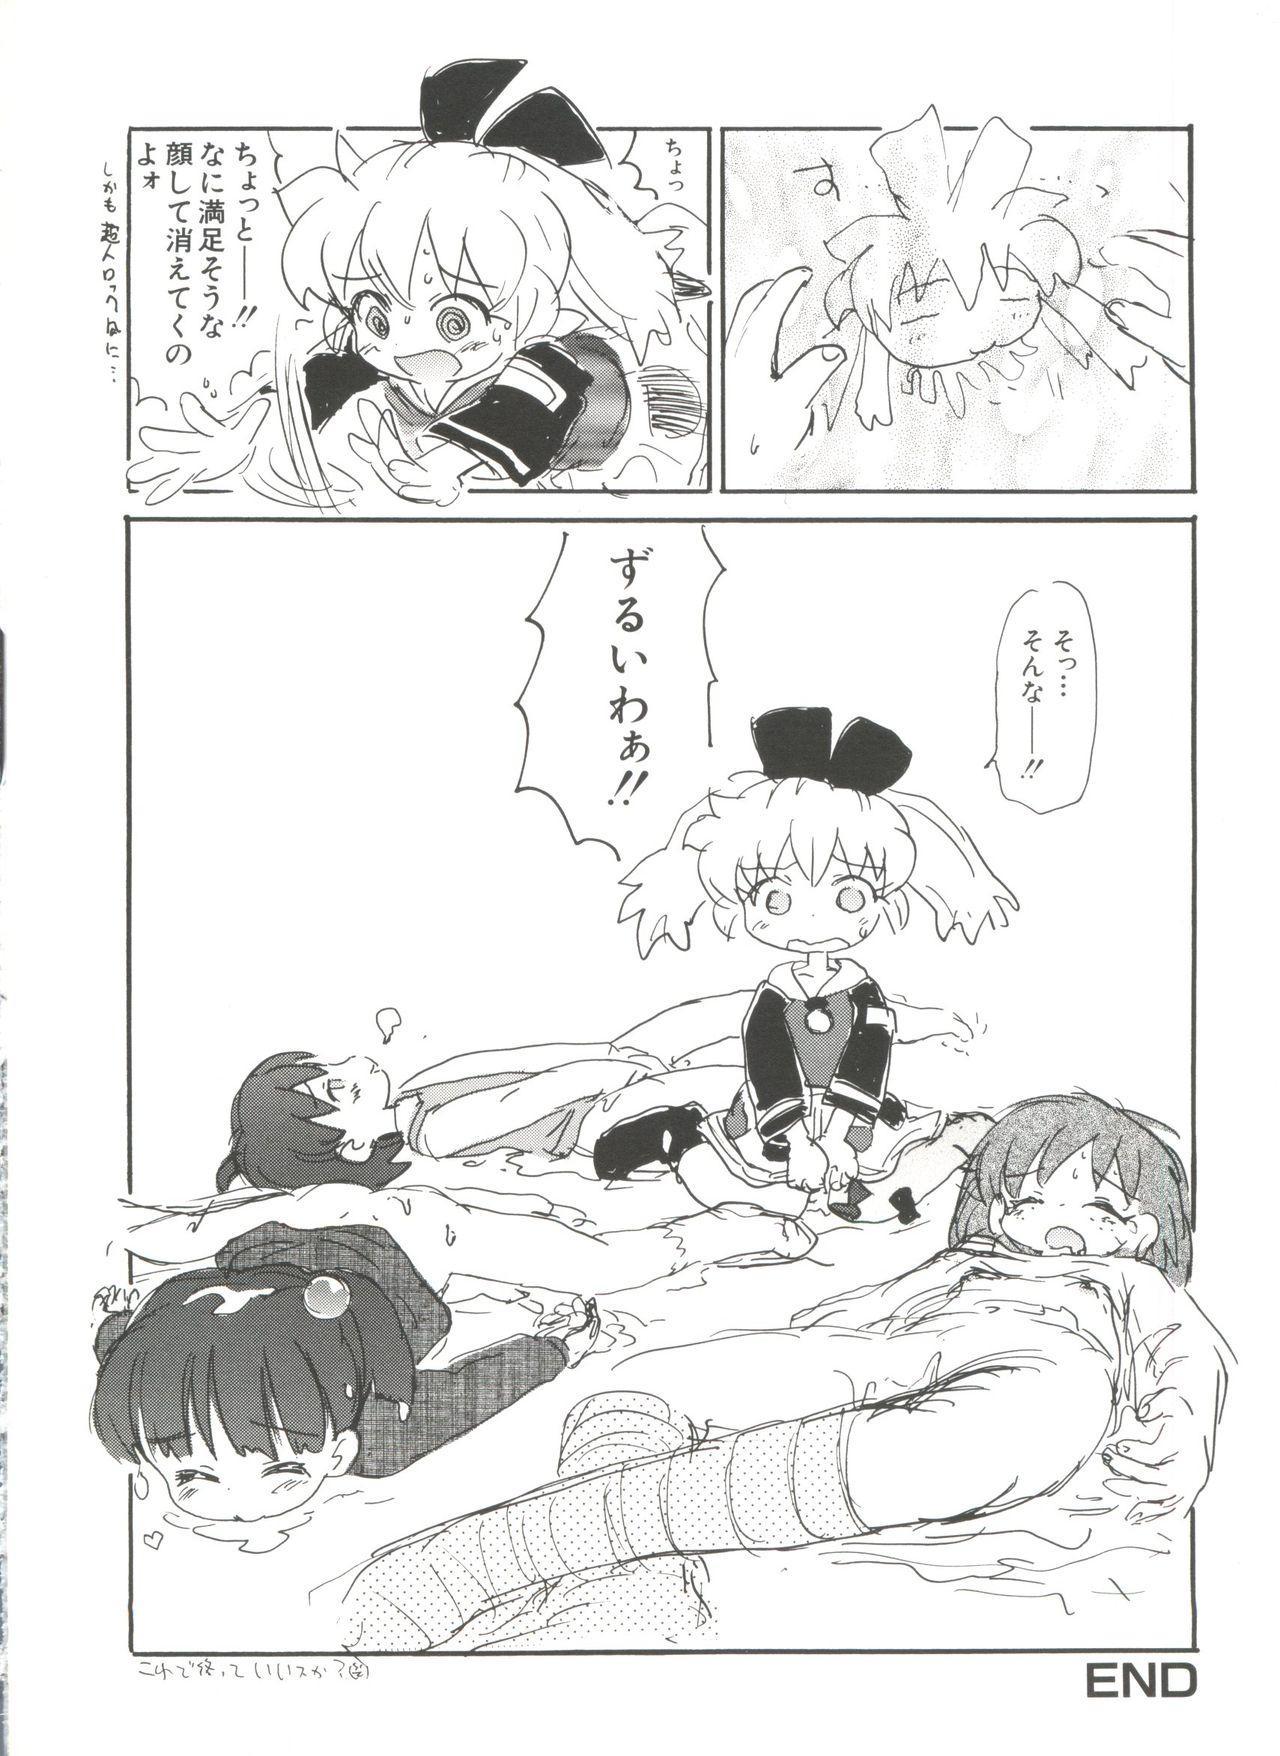 [Anthology] Denei Tamatebako 8 - Utakata no Tenshi-tachi II (Various) 35